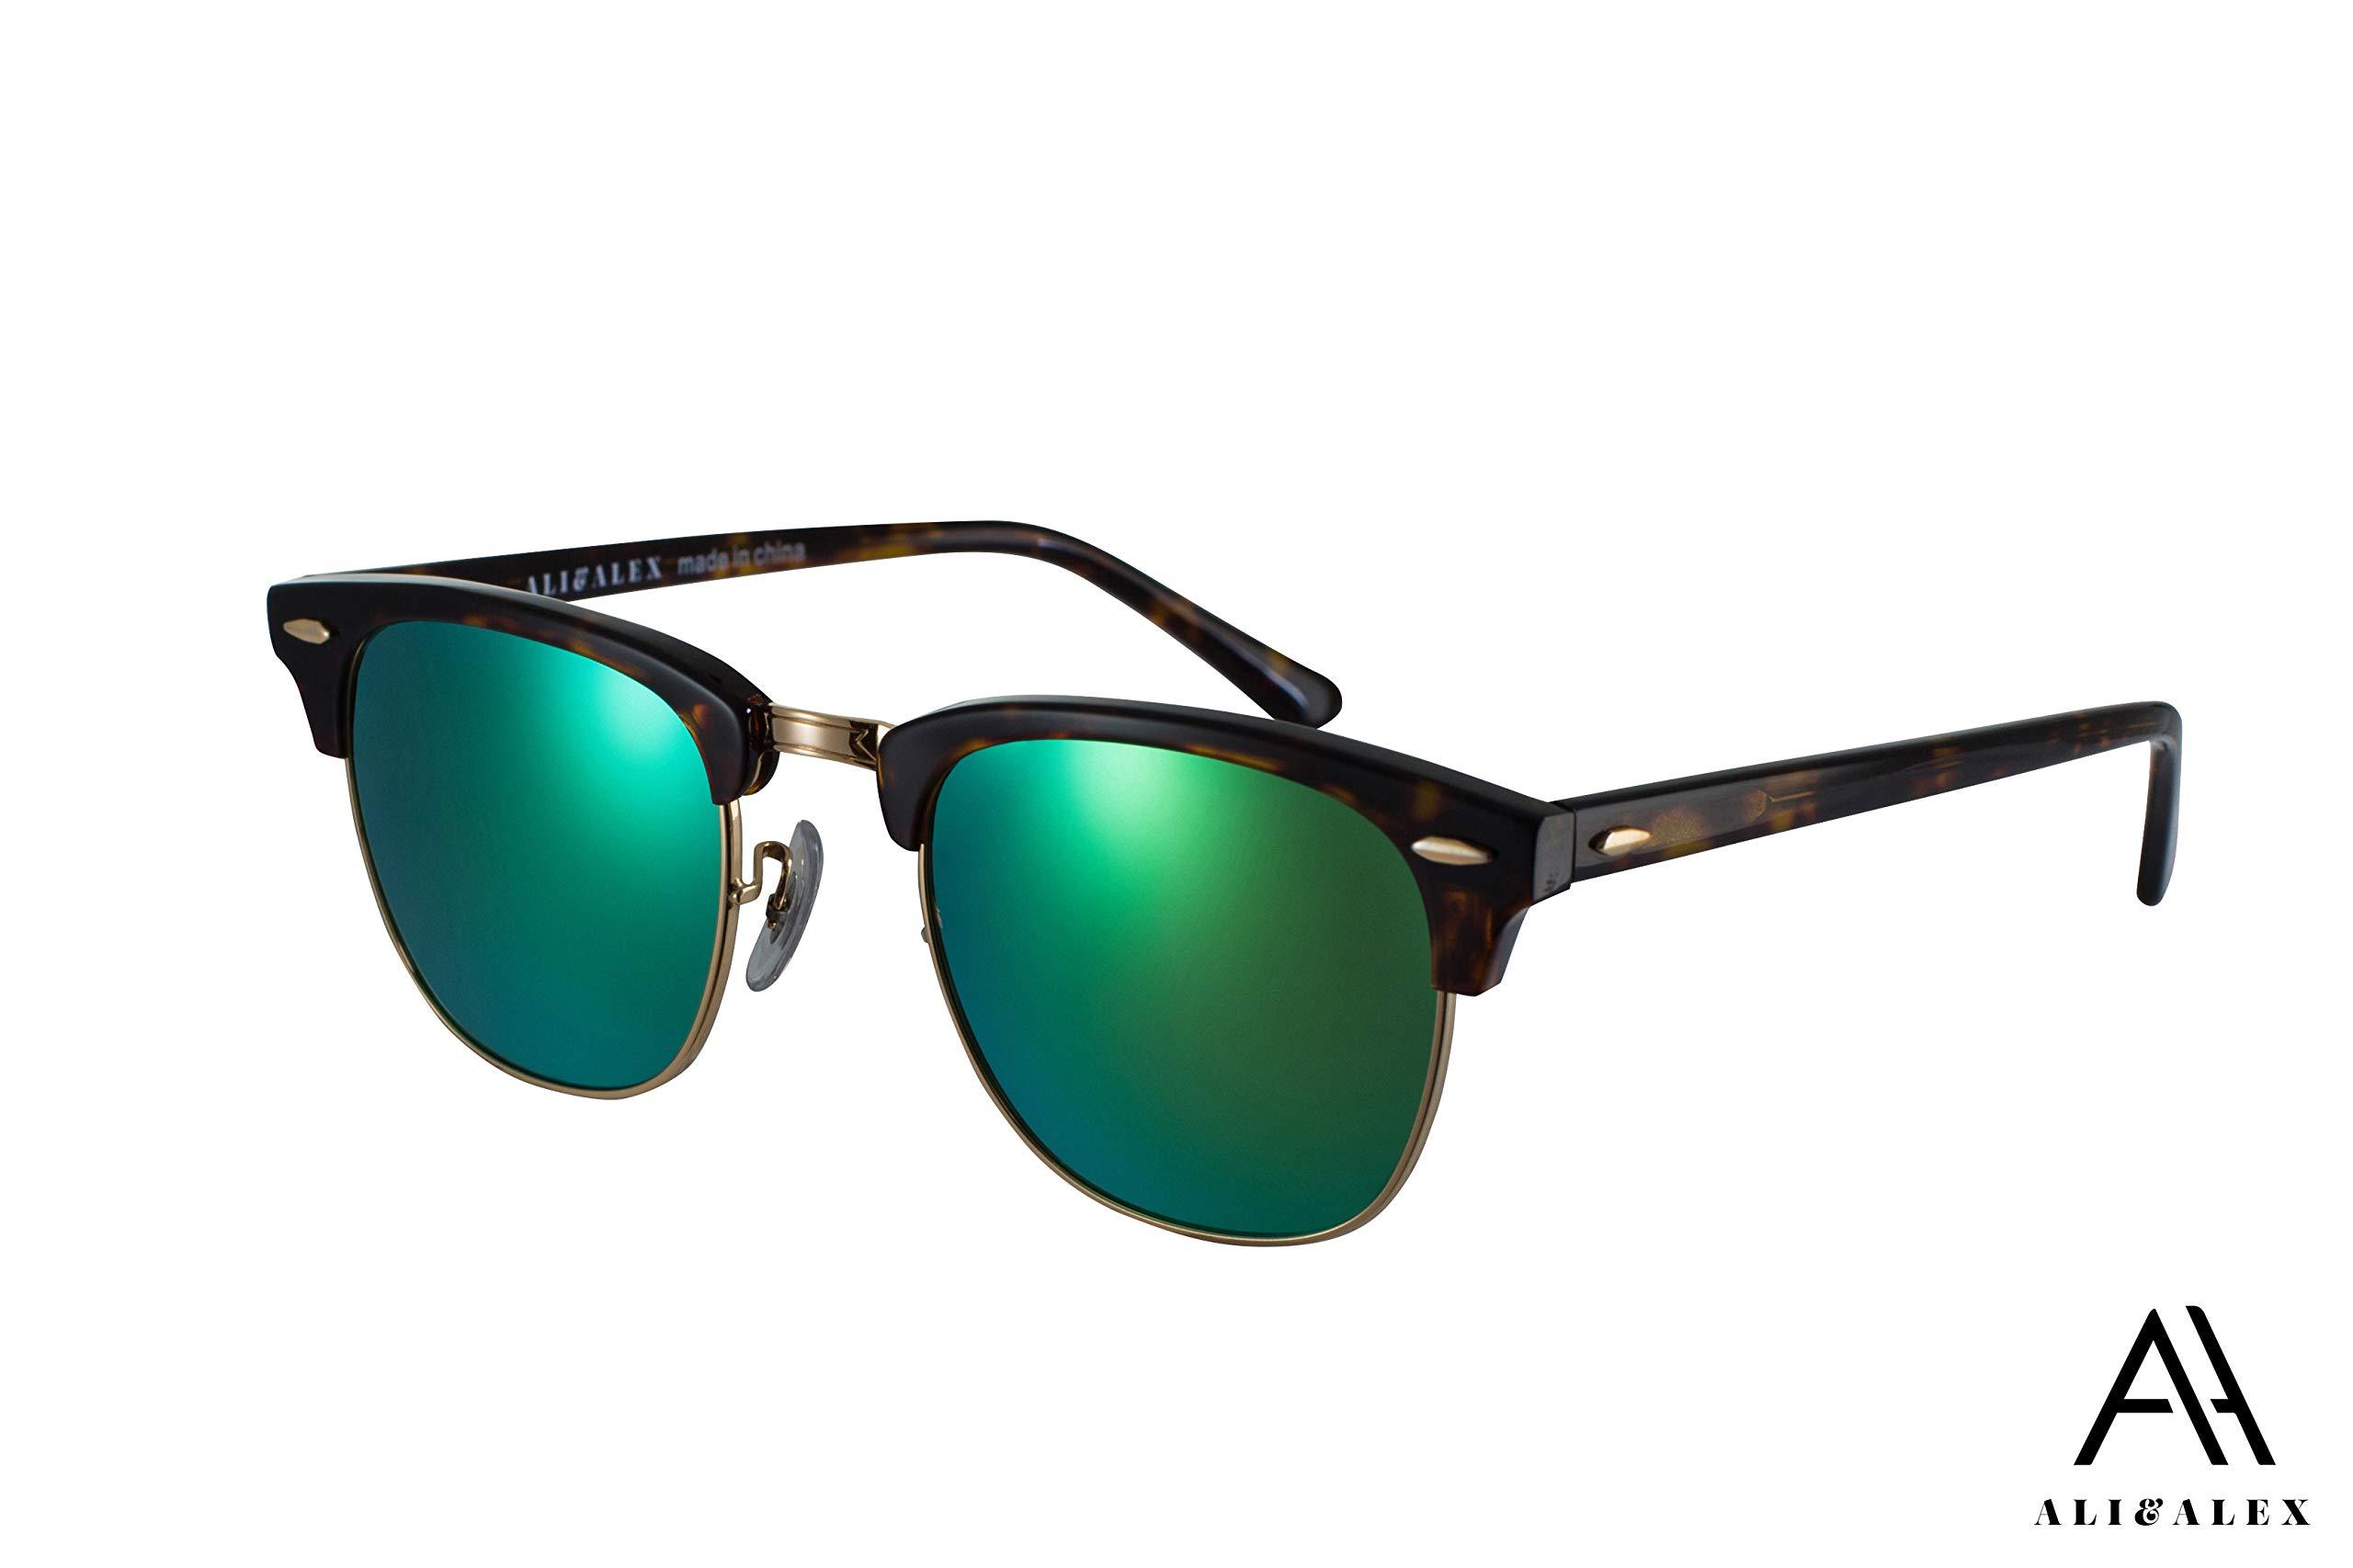 Ali&Alex Jamie Clubmaster Semi Rimless UV Polarized Adult Designer Sunglasses for Men & Women